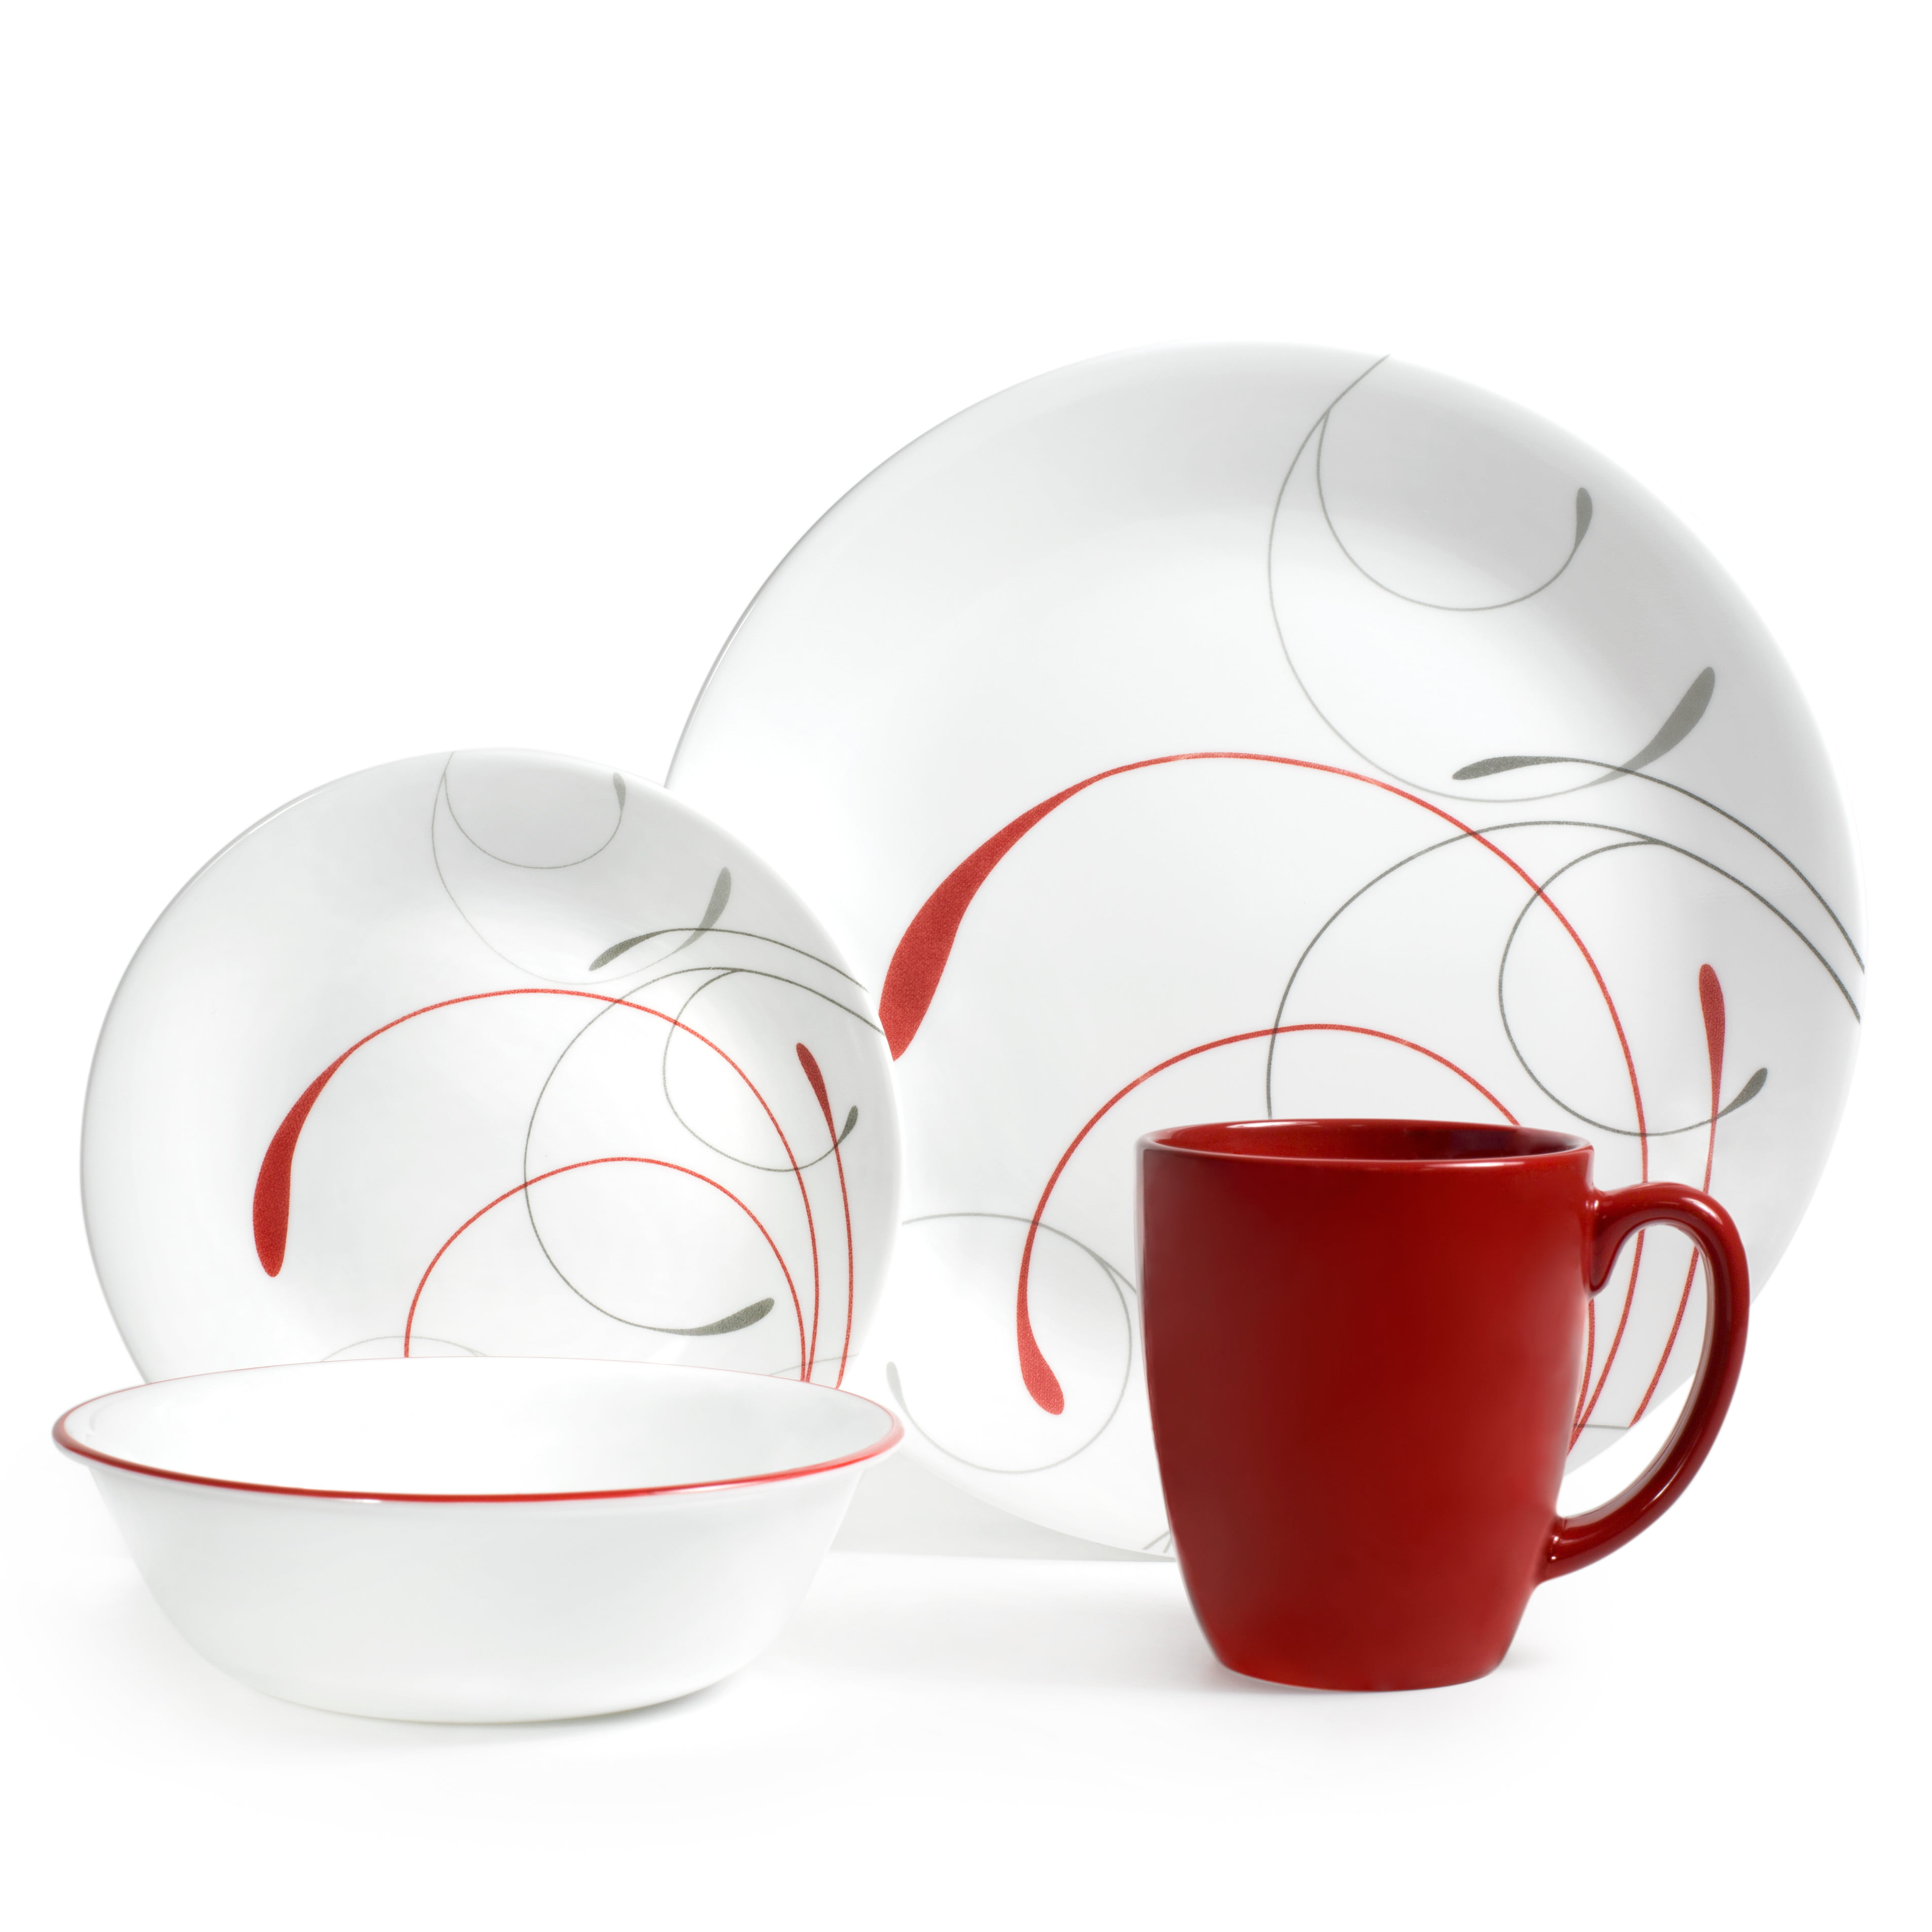 Corelle Livingware Splendor 16-piece Dinnerware Set Round Stoneware Oven Safe  sc 1 st  eBay & Corelle Livingware Splendor 16-piece Dinnerware Set Round Stoneware ...